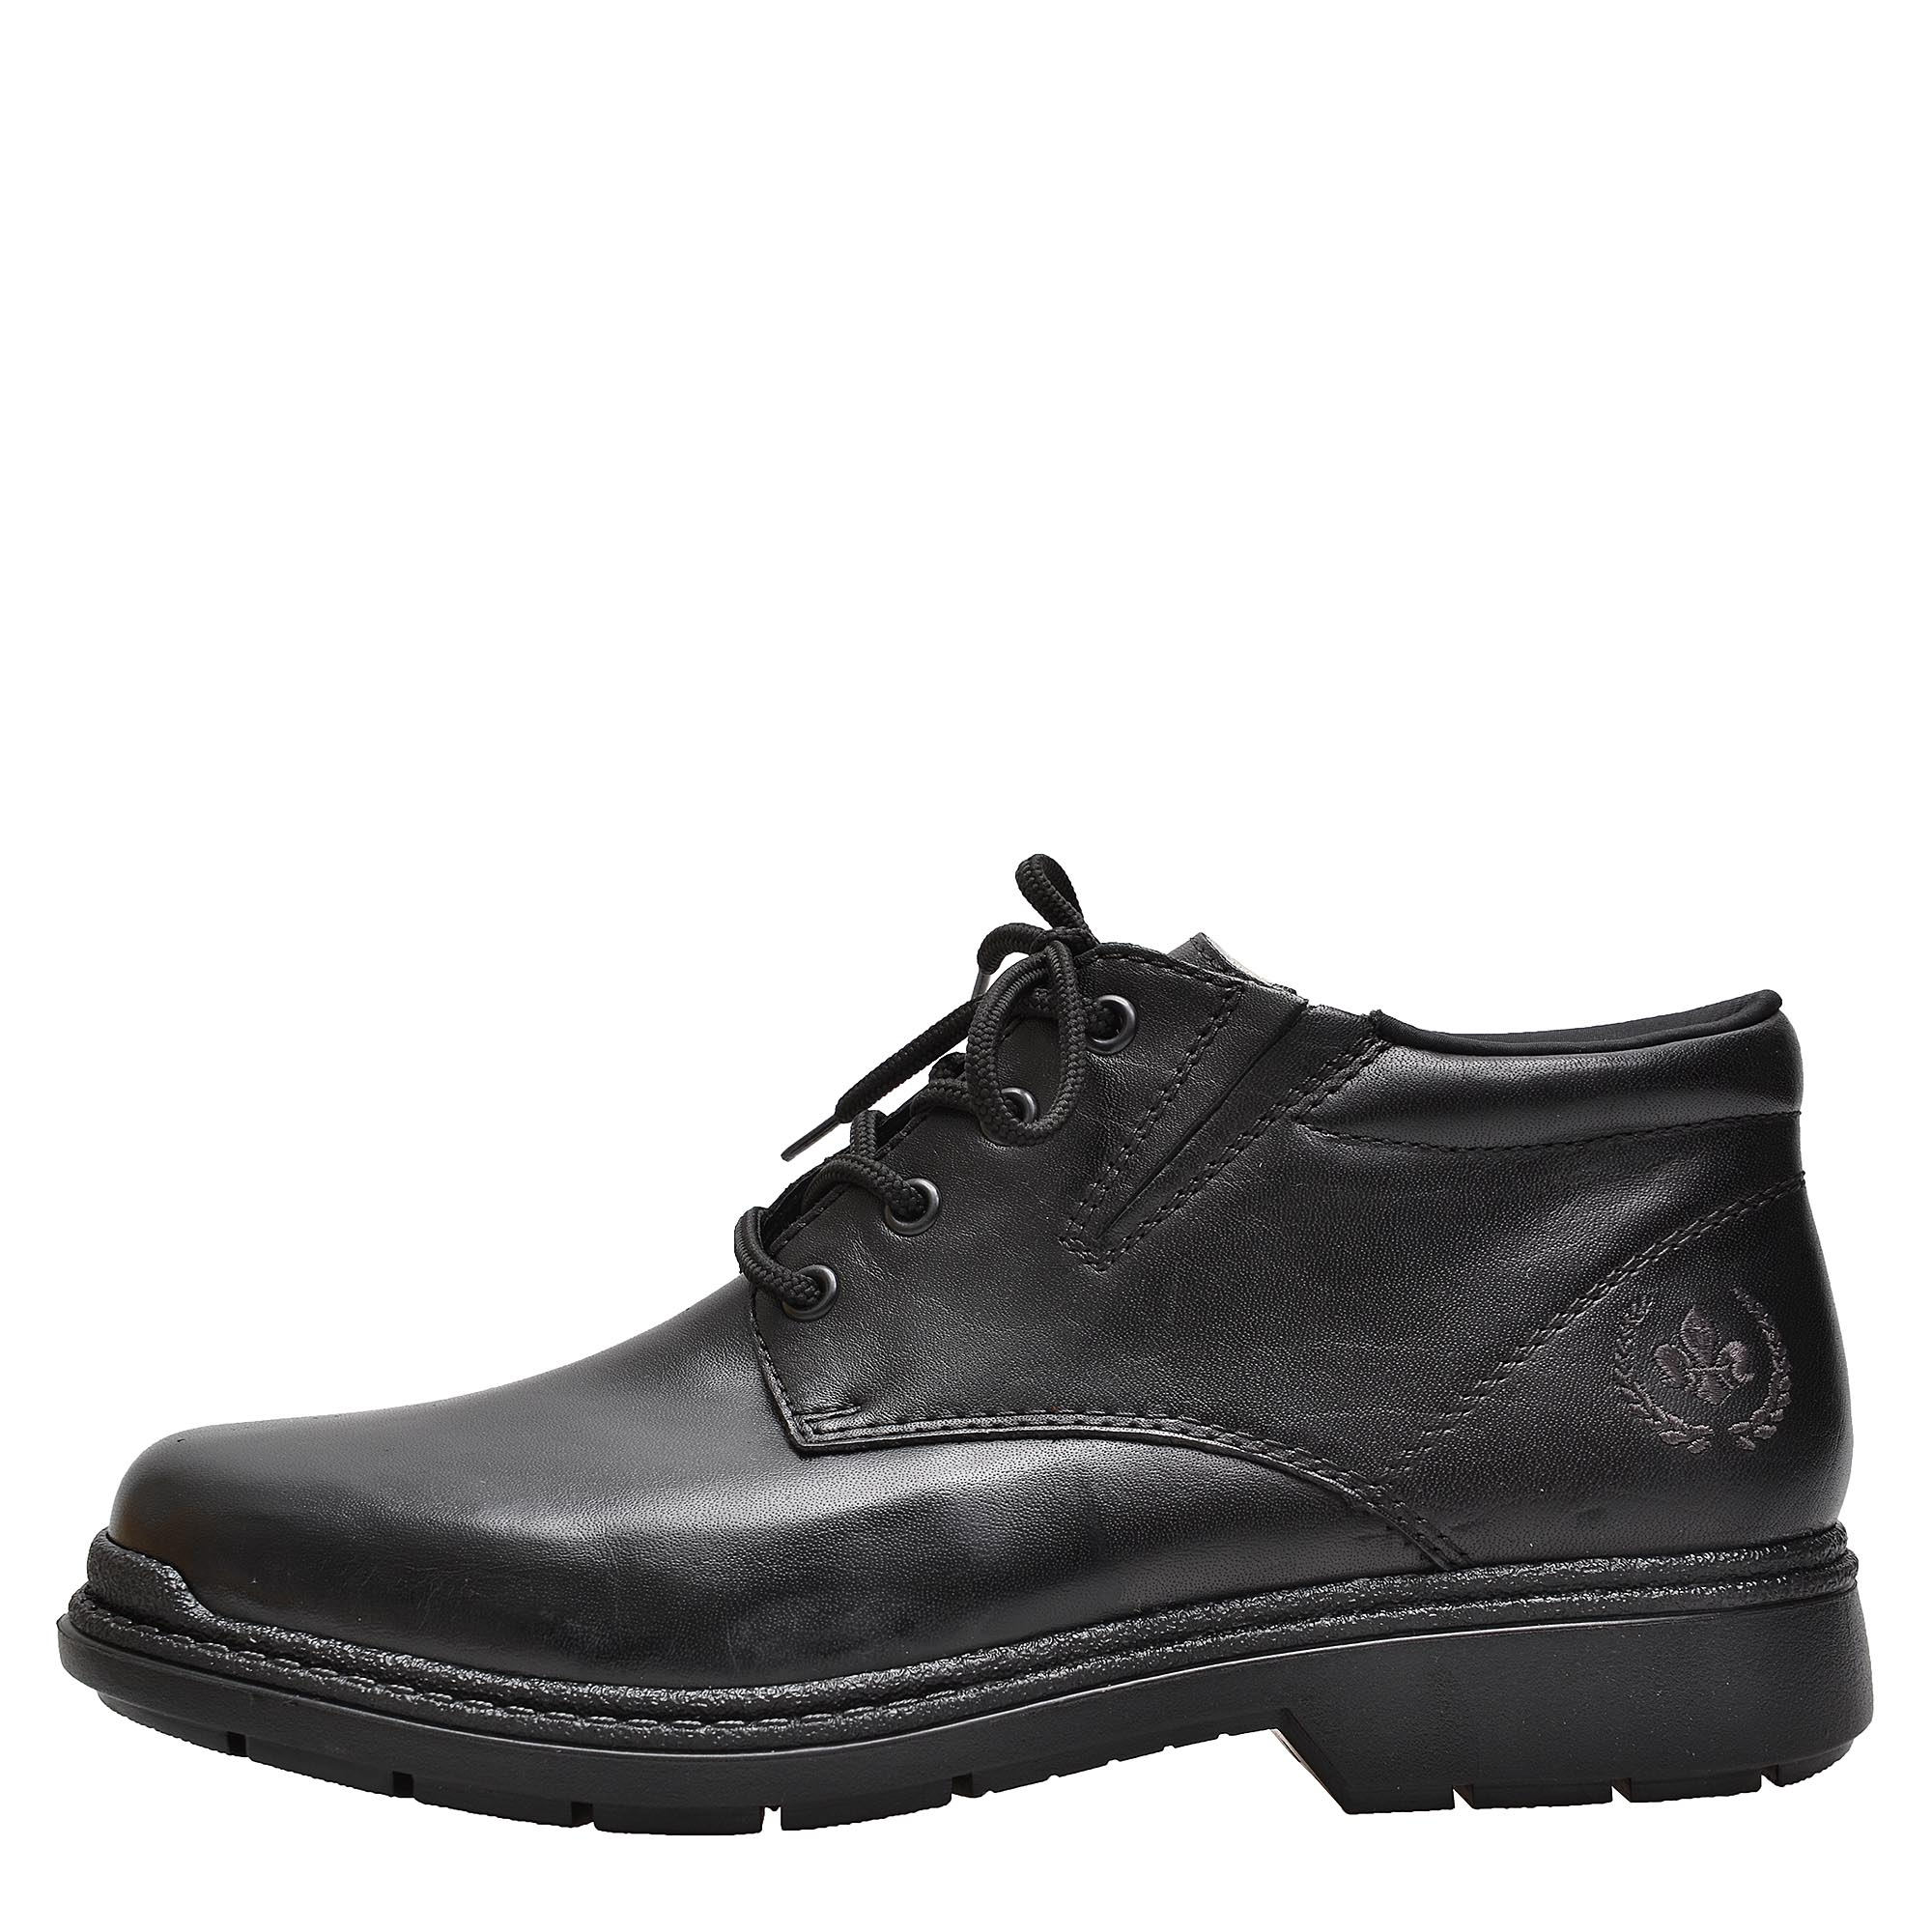 Pánska obuv RIEKERB0731 00 SCHWARZ H W 8  24752a9d157